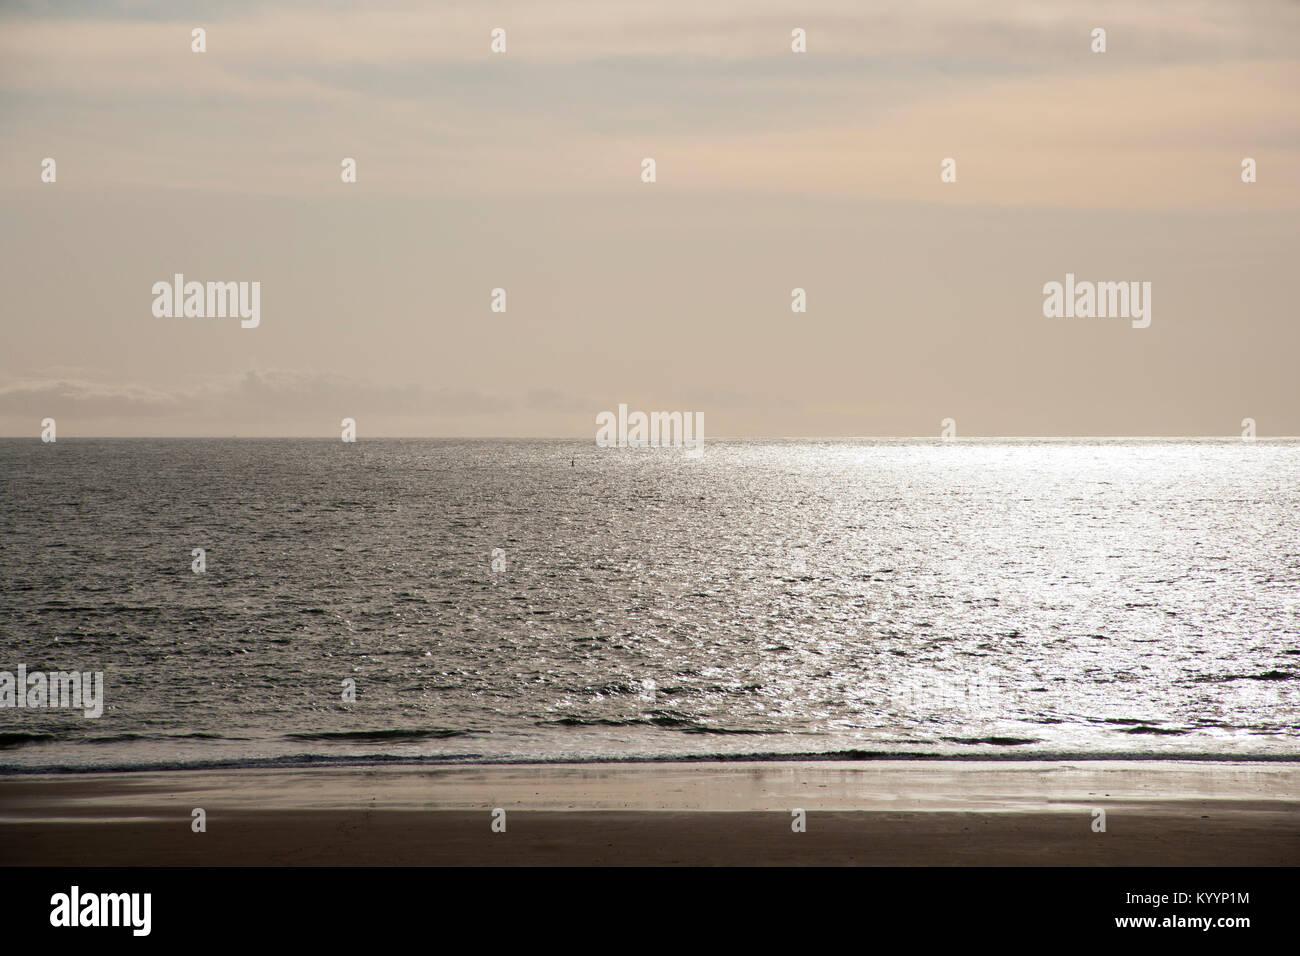 Sunlight gleaming on atmospheric peaceful empty beach and sea horizon - Stock Image